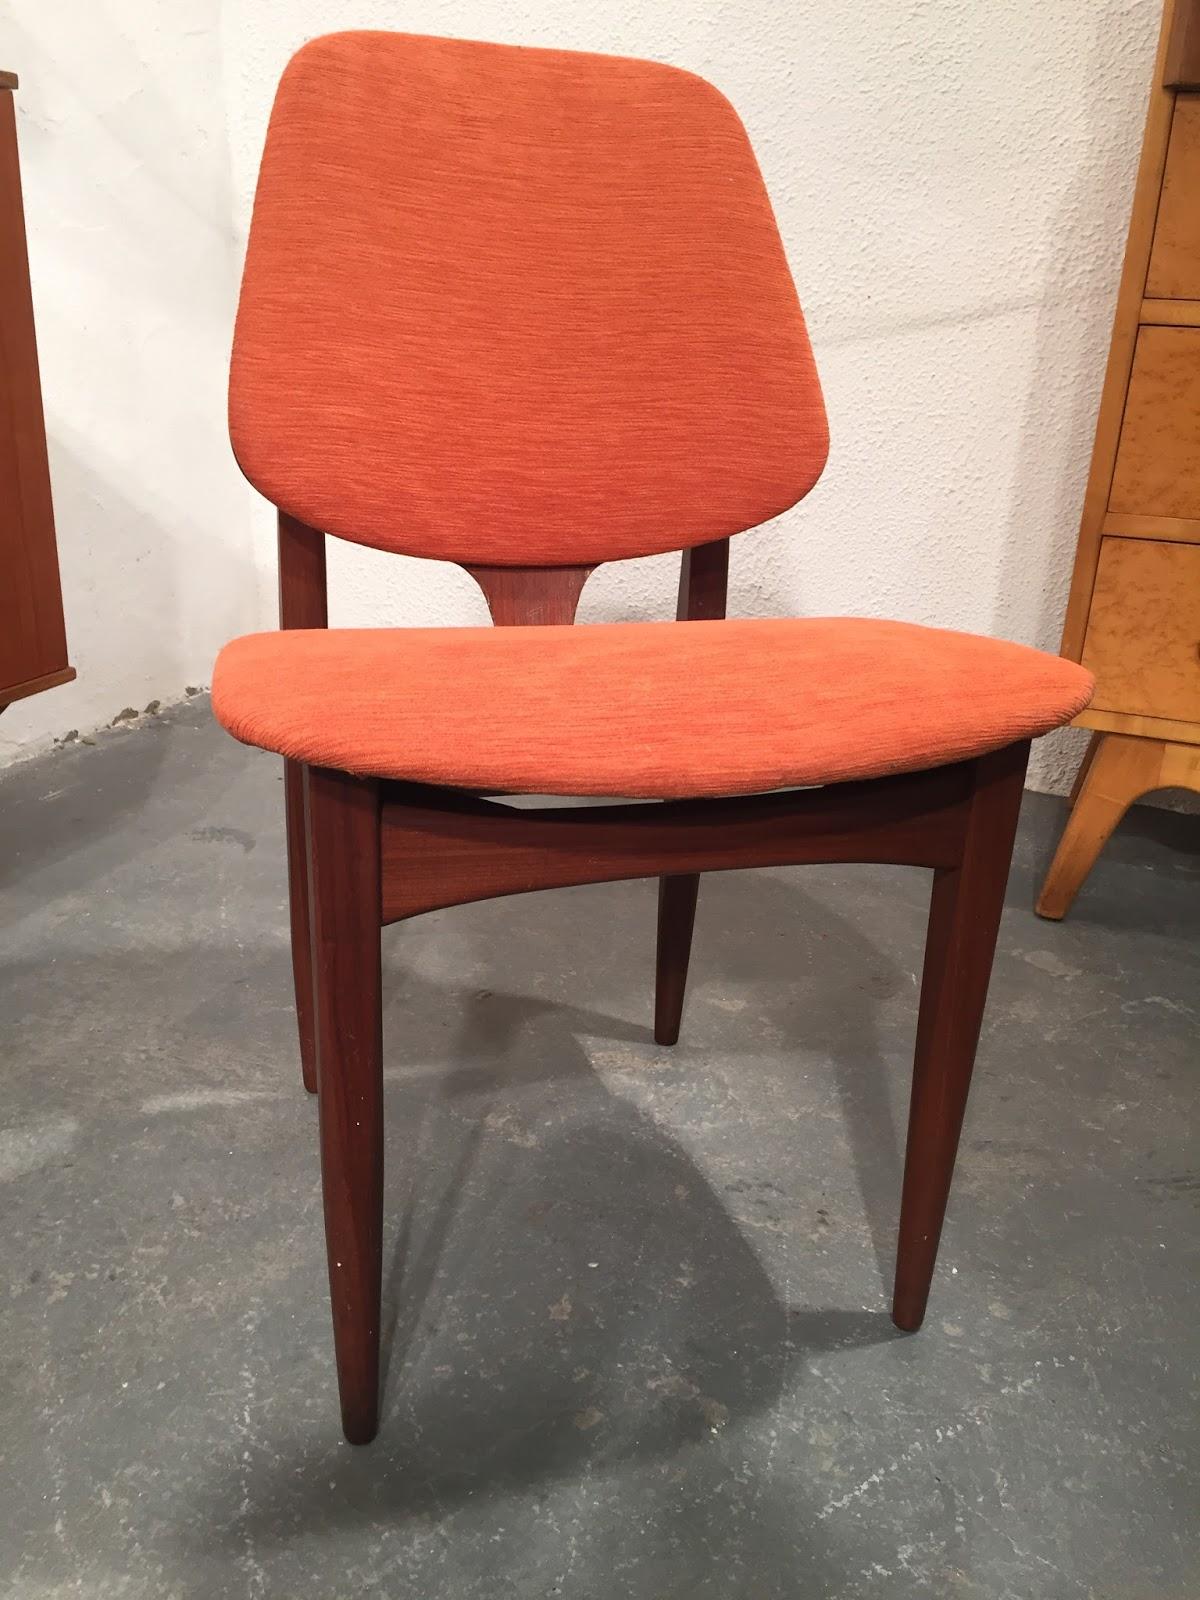 retro dining chairs ireland desk chair ebay ocd vintage furniture